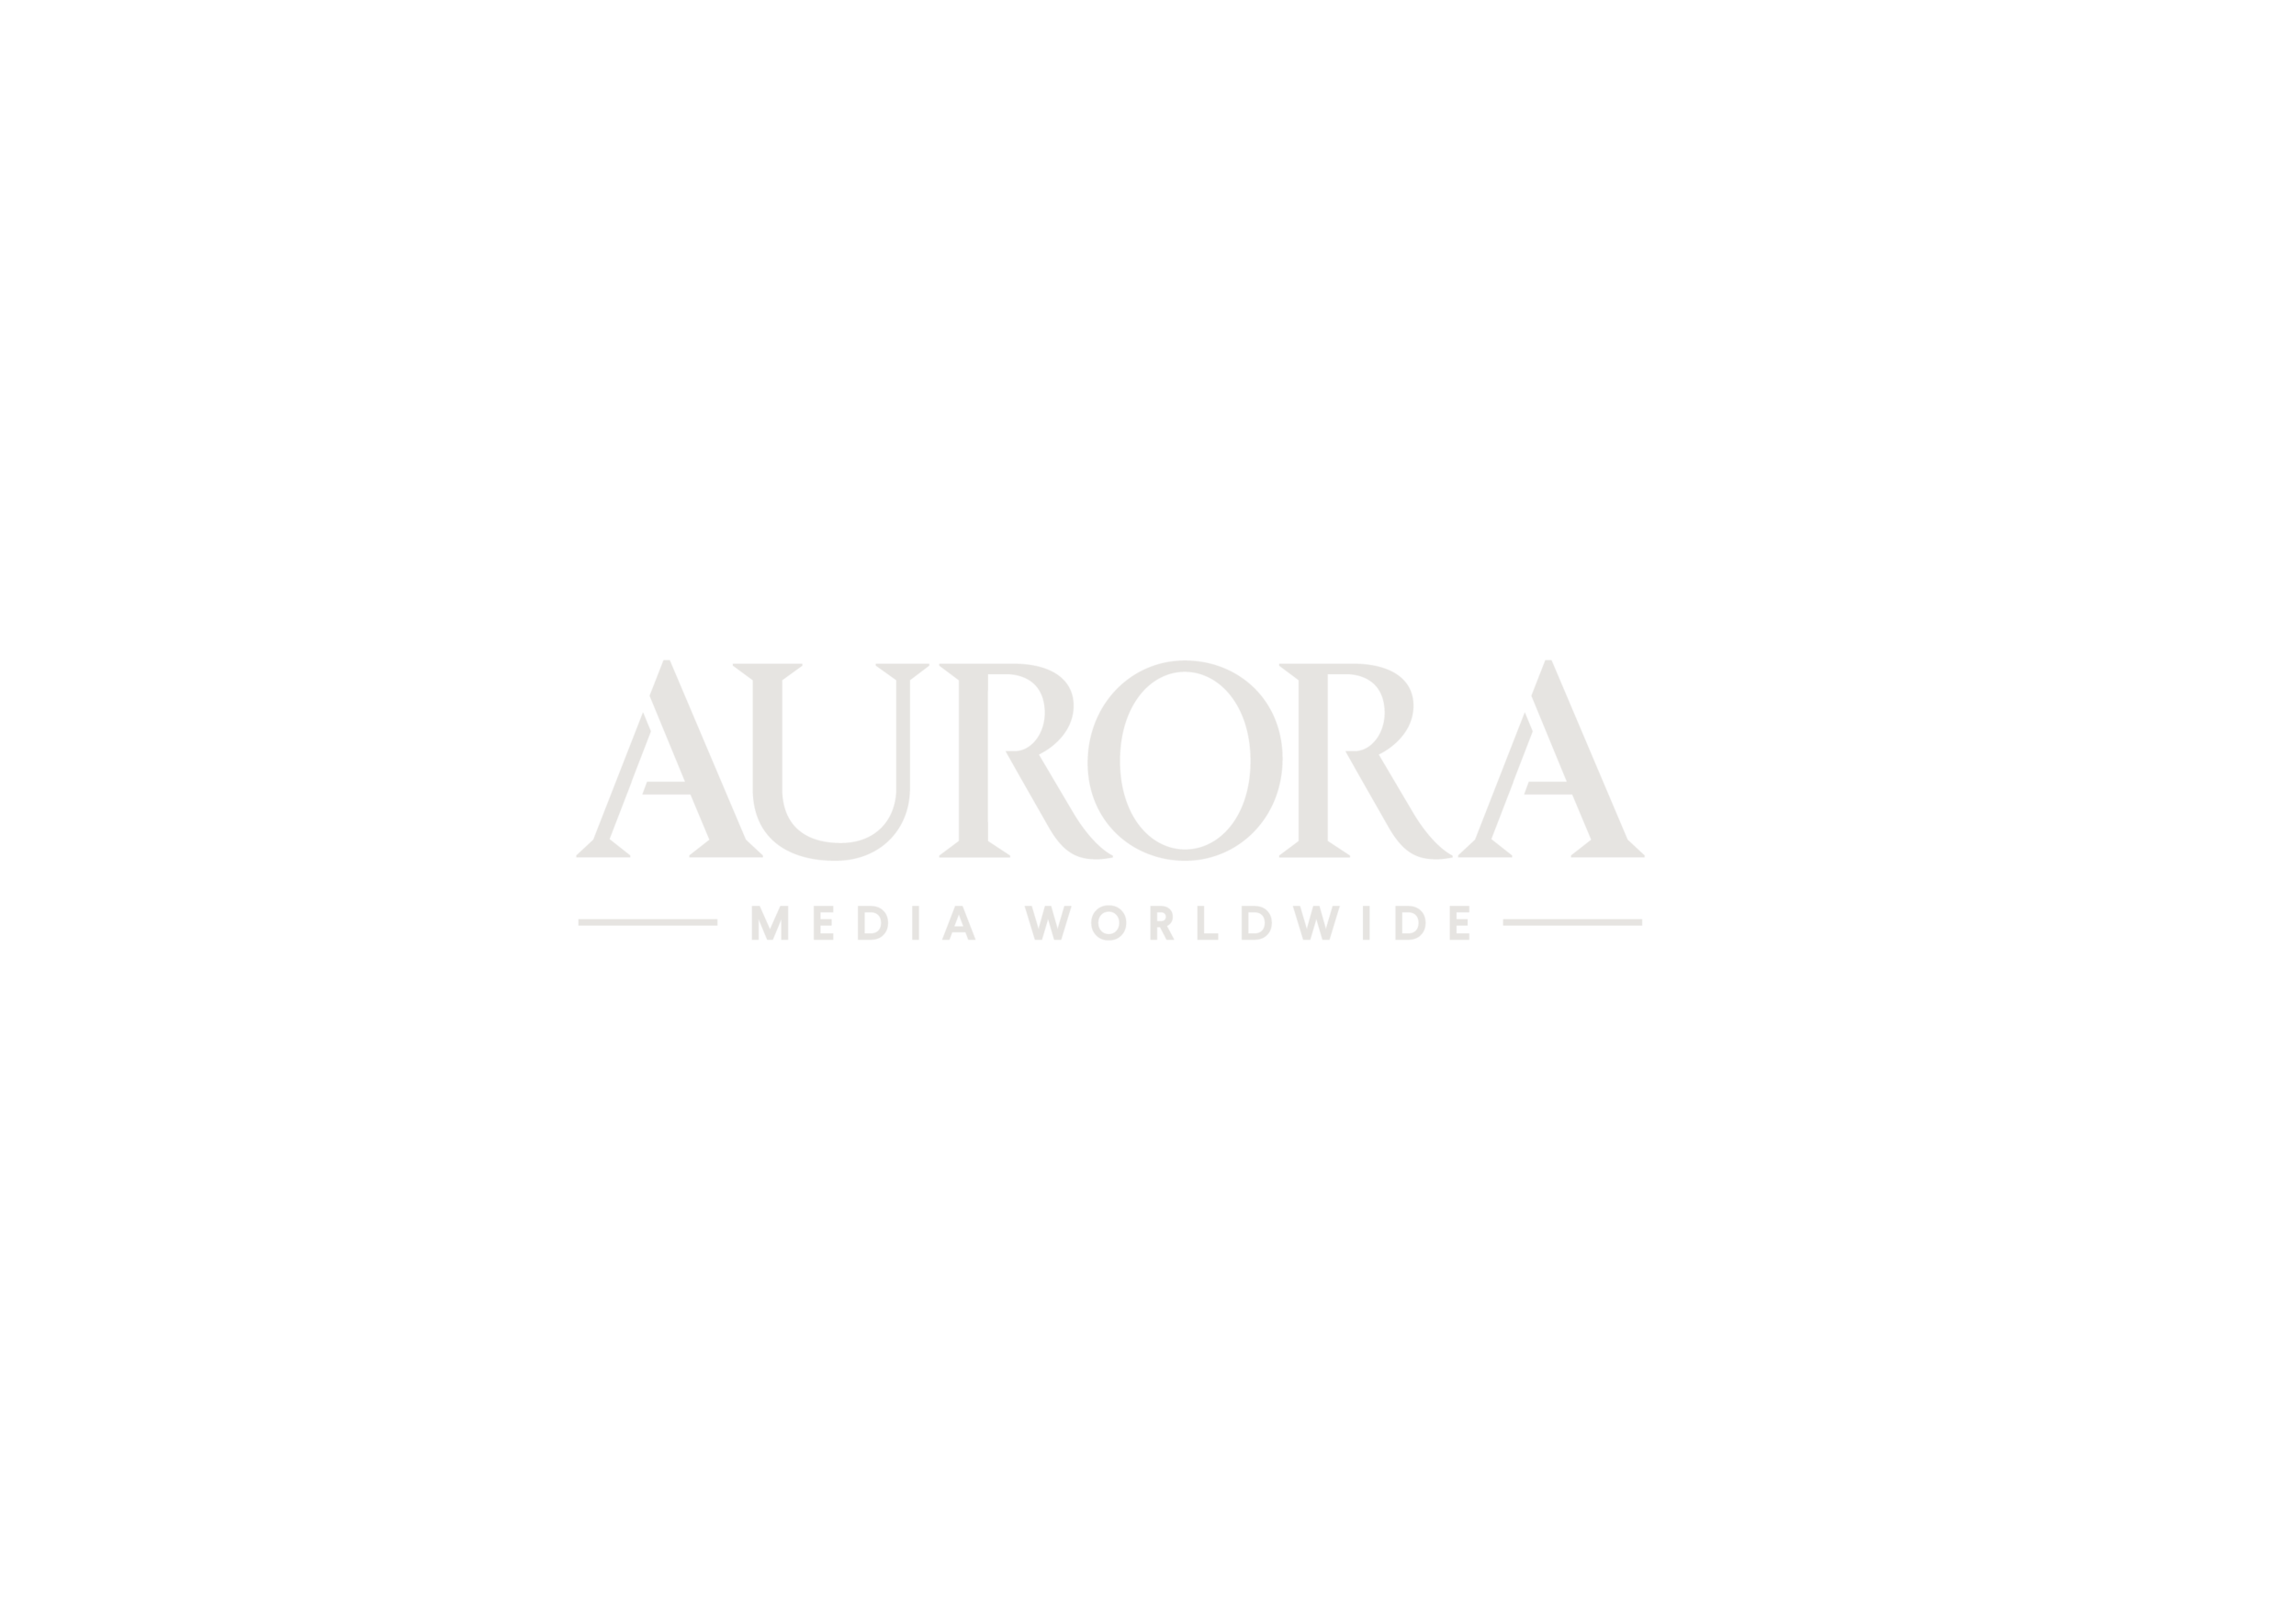 V1 Aurora Logos Guidlines DD-36.png